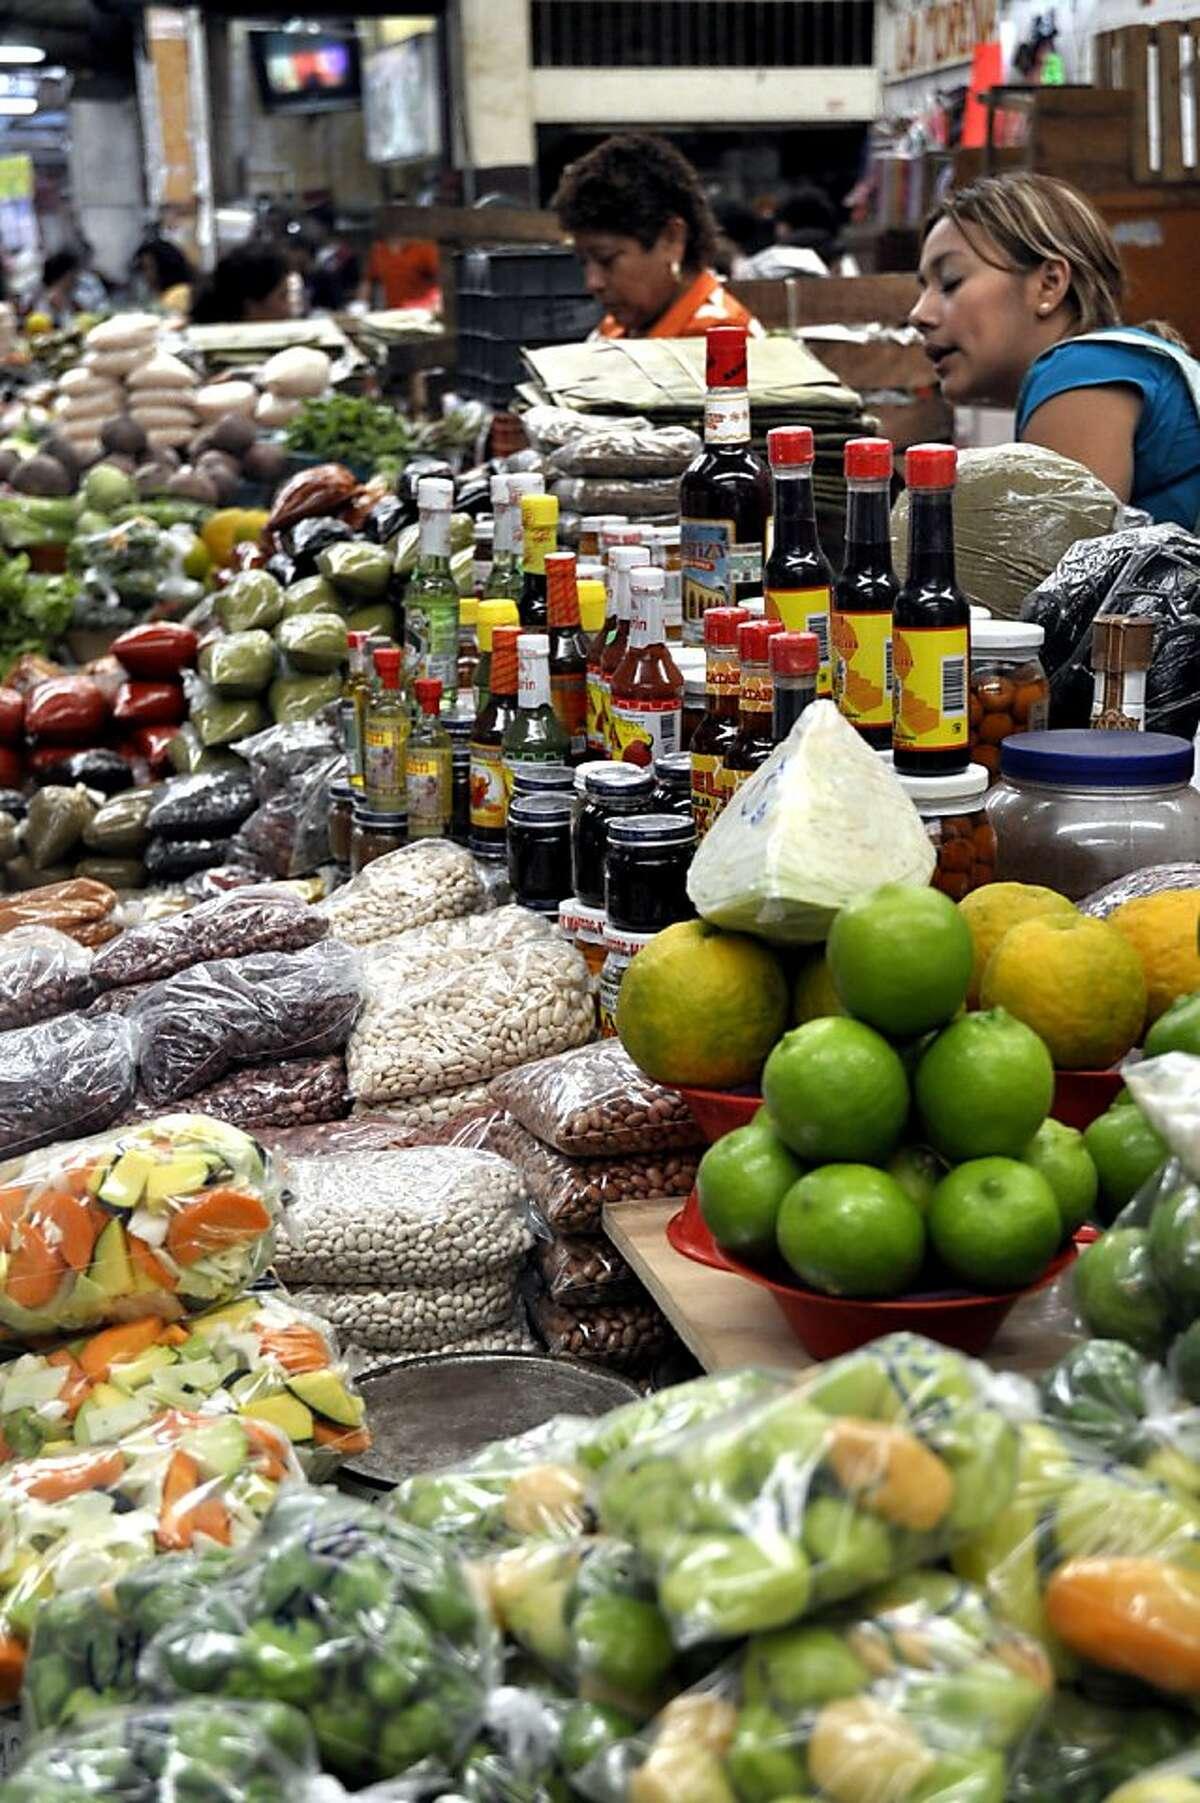 A visit to Mercado Lucas de Galvez, a traditional Mexican market sprawling over several blocks, can be a crash course in the Yucatan's unique cuisine.